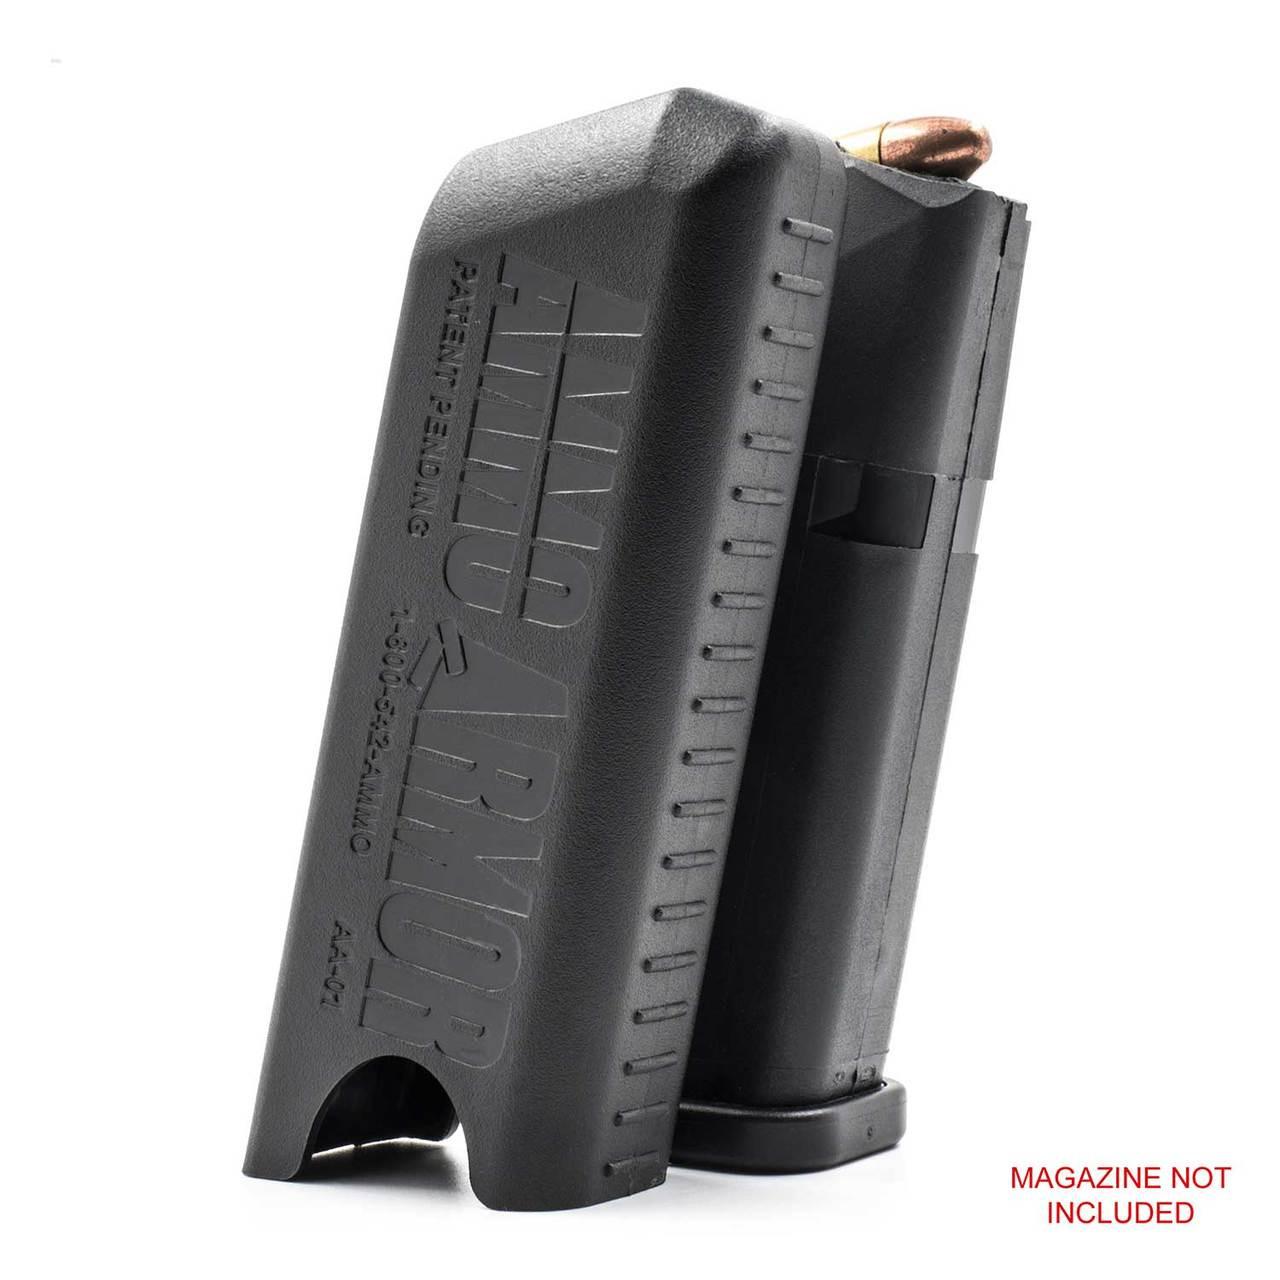 Glock 23 Magazine Protector